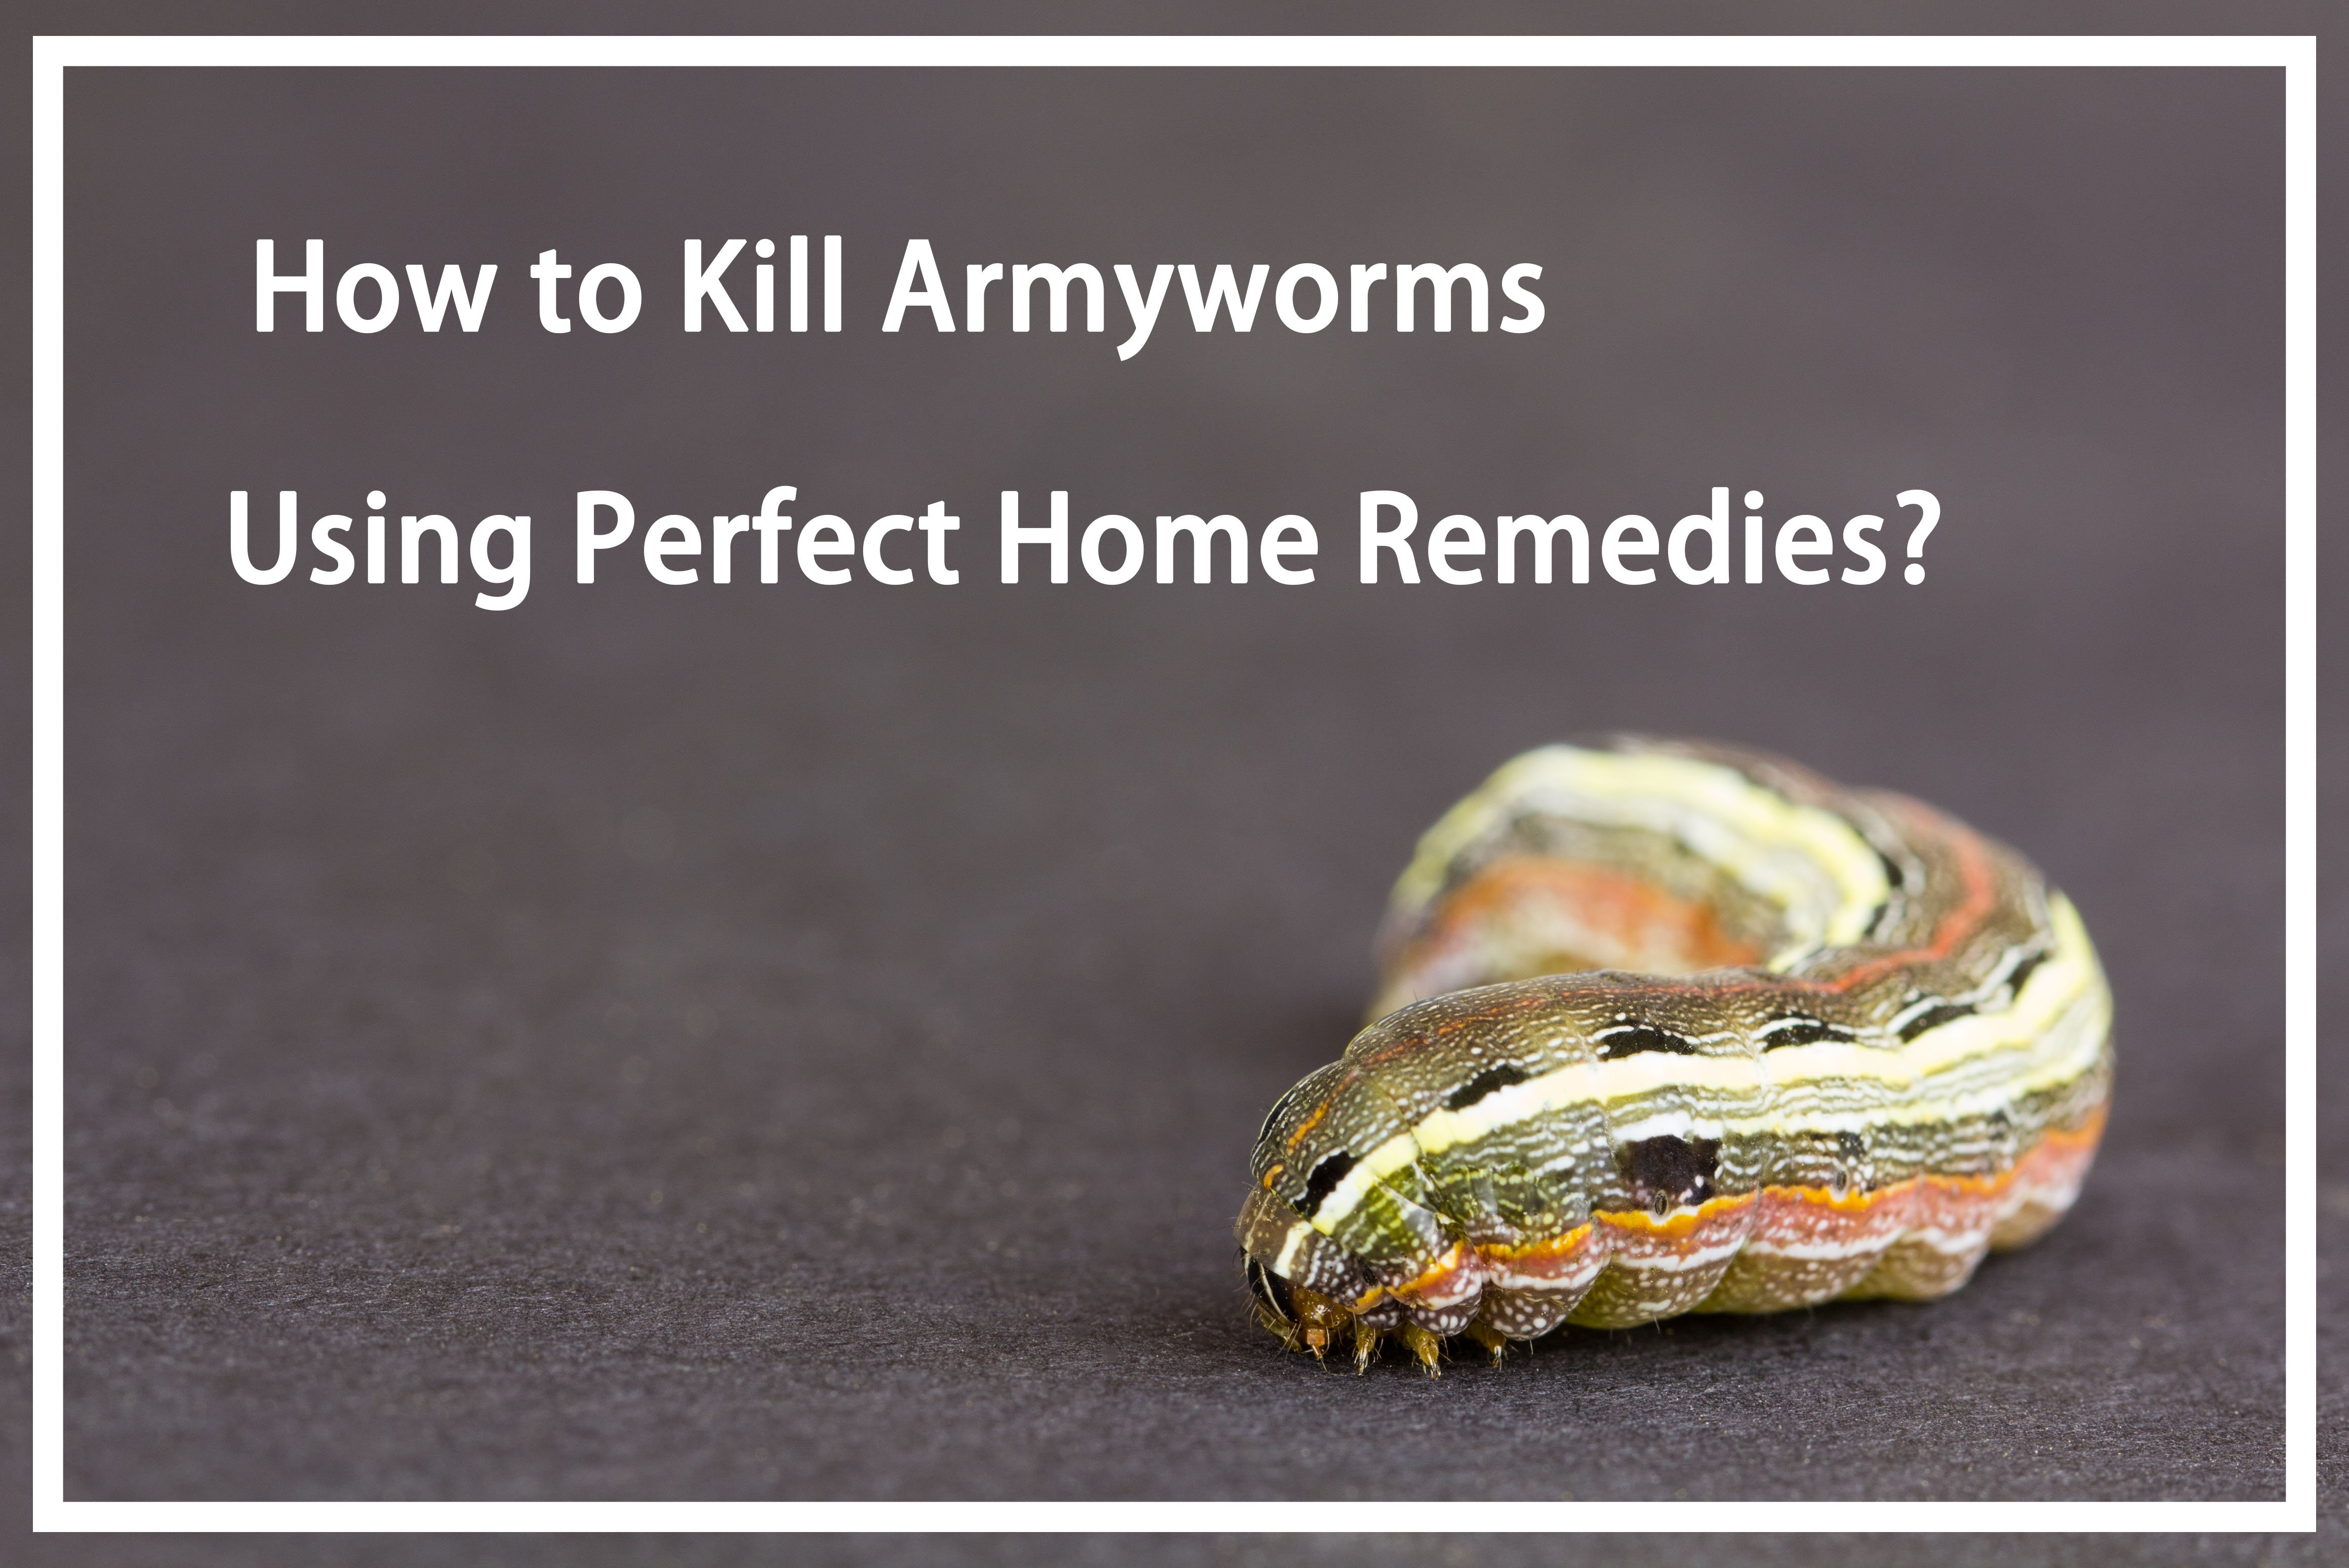 Kill Armyworms